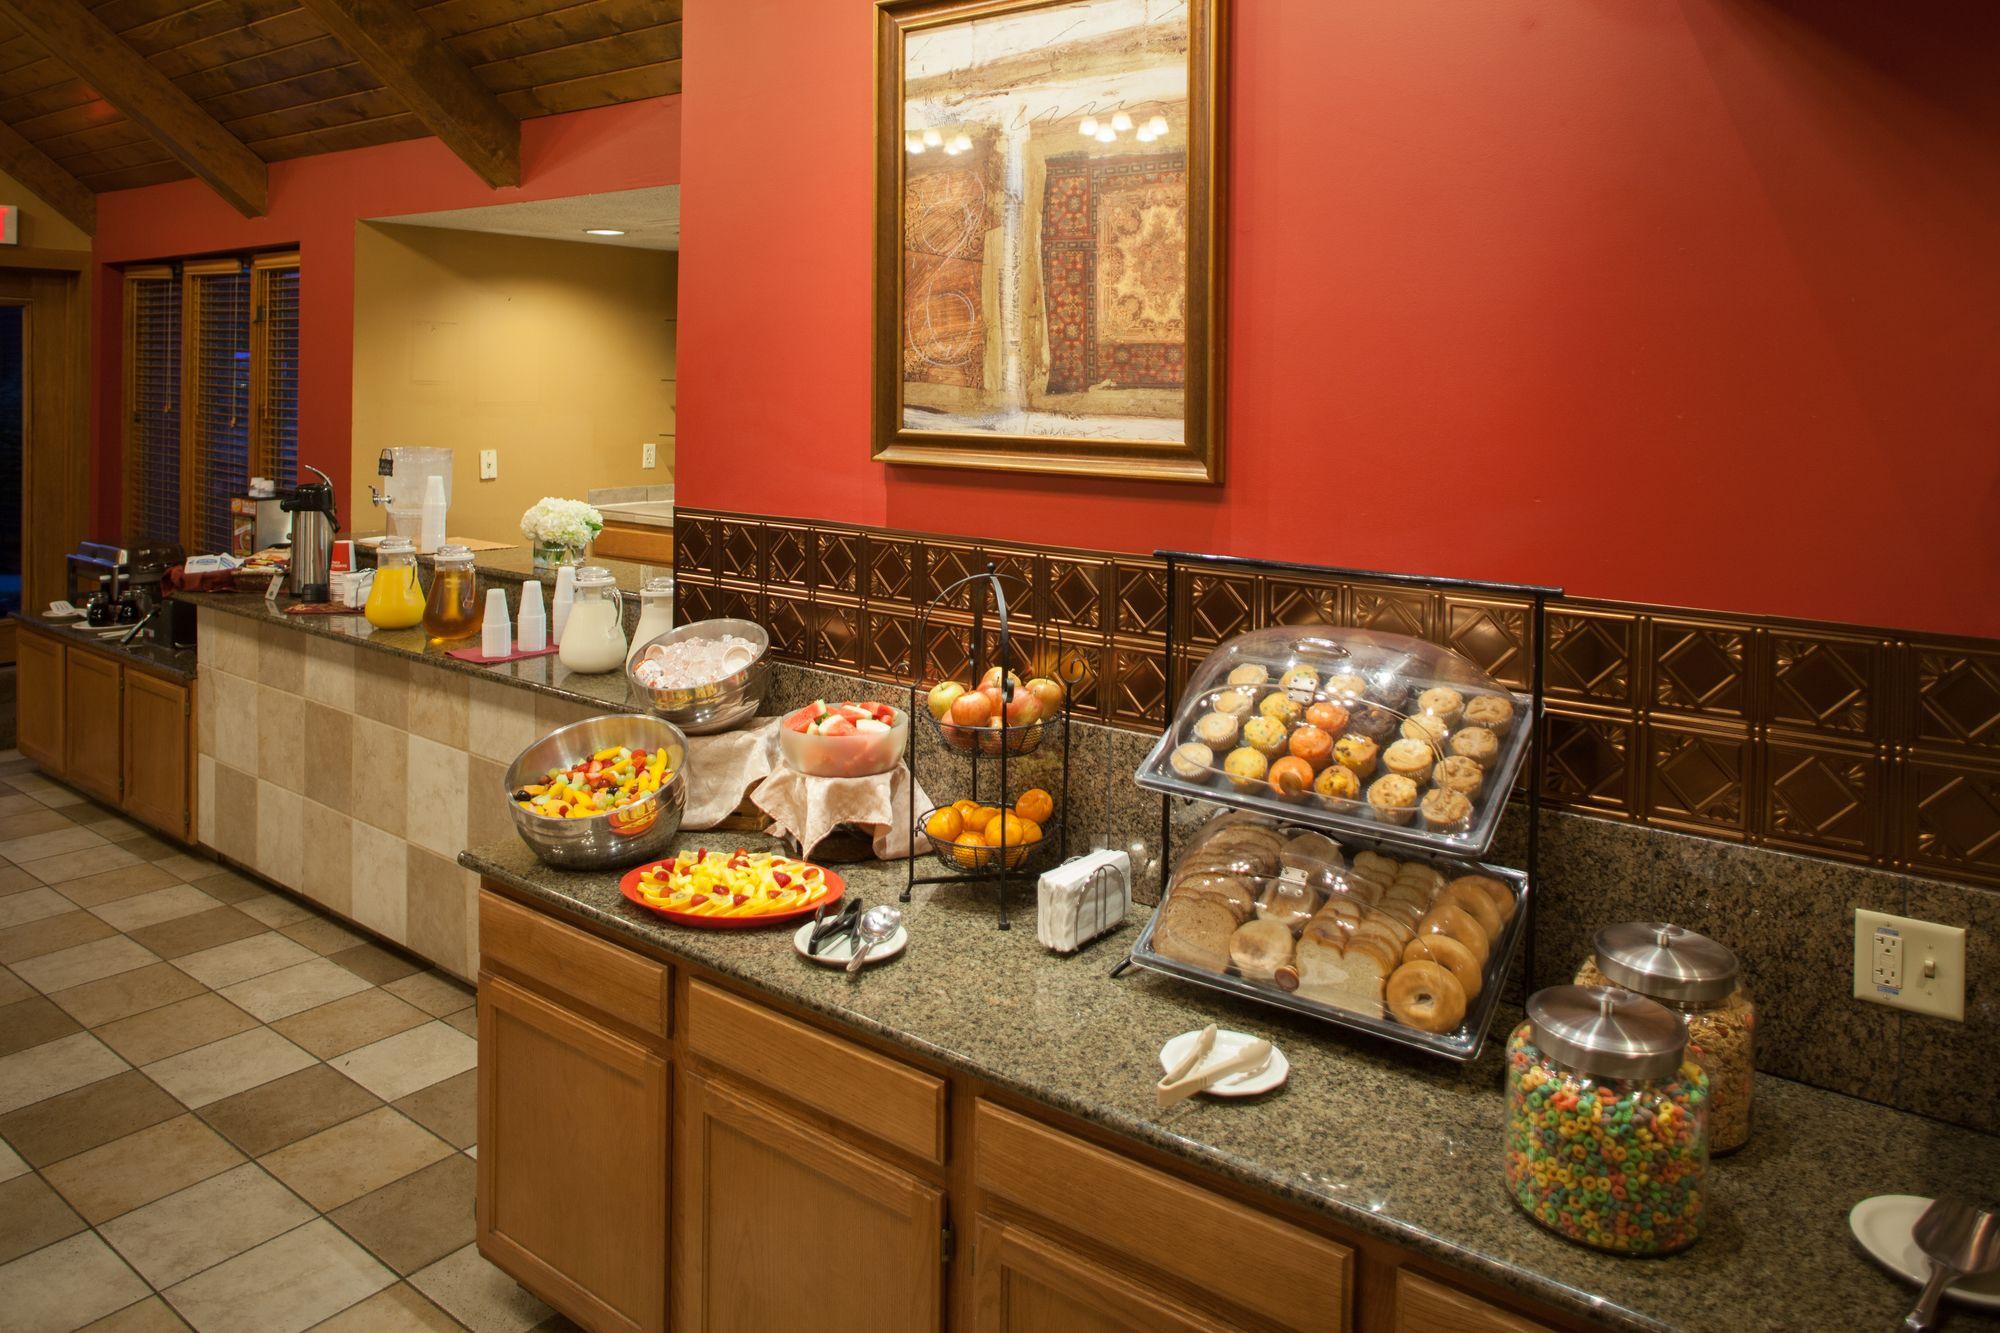 fruit loc ne store eagle lincoln extended stay wiki file nebraska capital and hotel